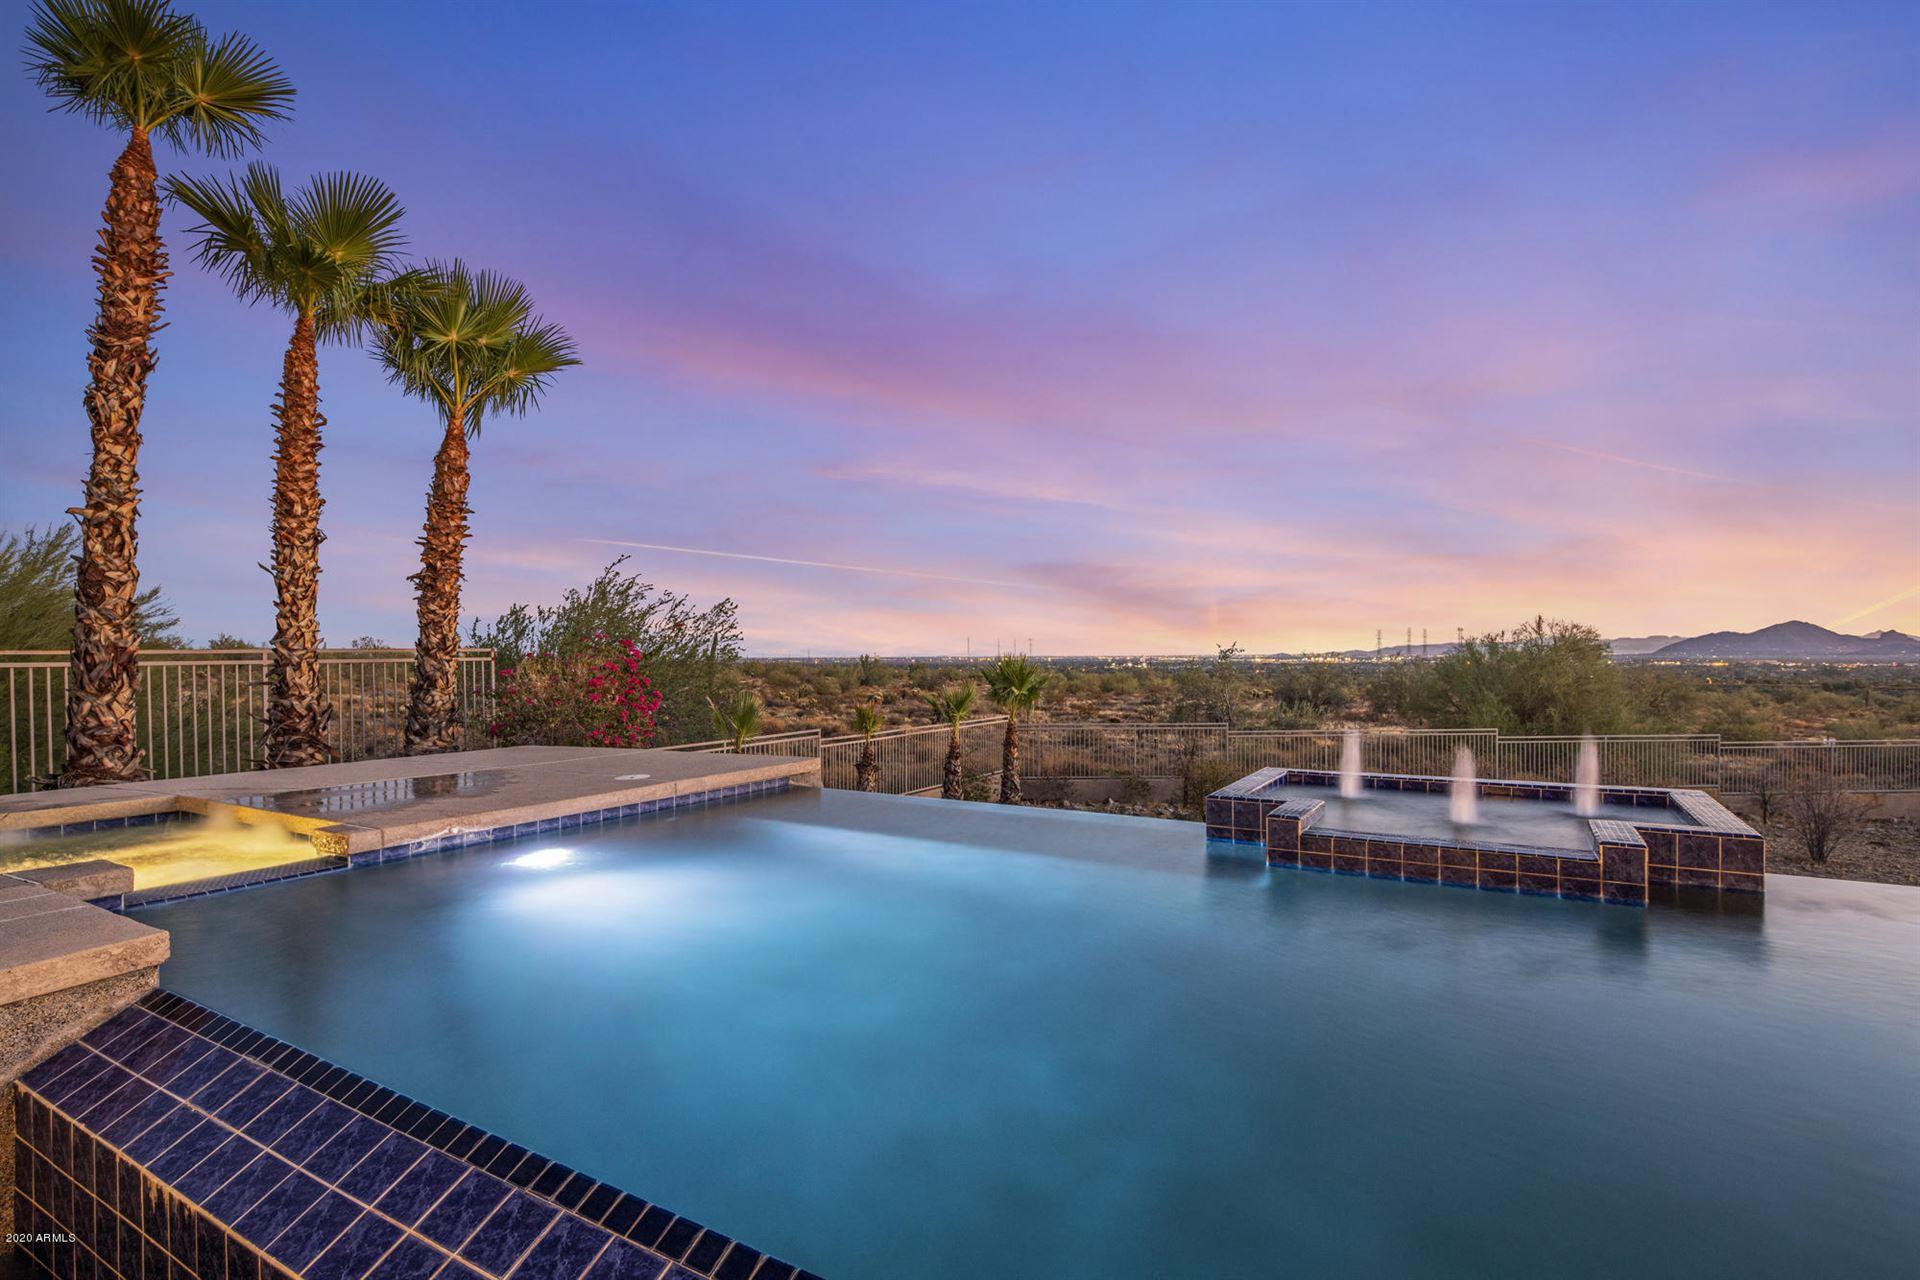 Photo of 10761 E LUDLOW Drive, Scottsdale, AZ 85255 (MLS # 6128606)